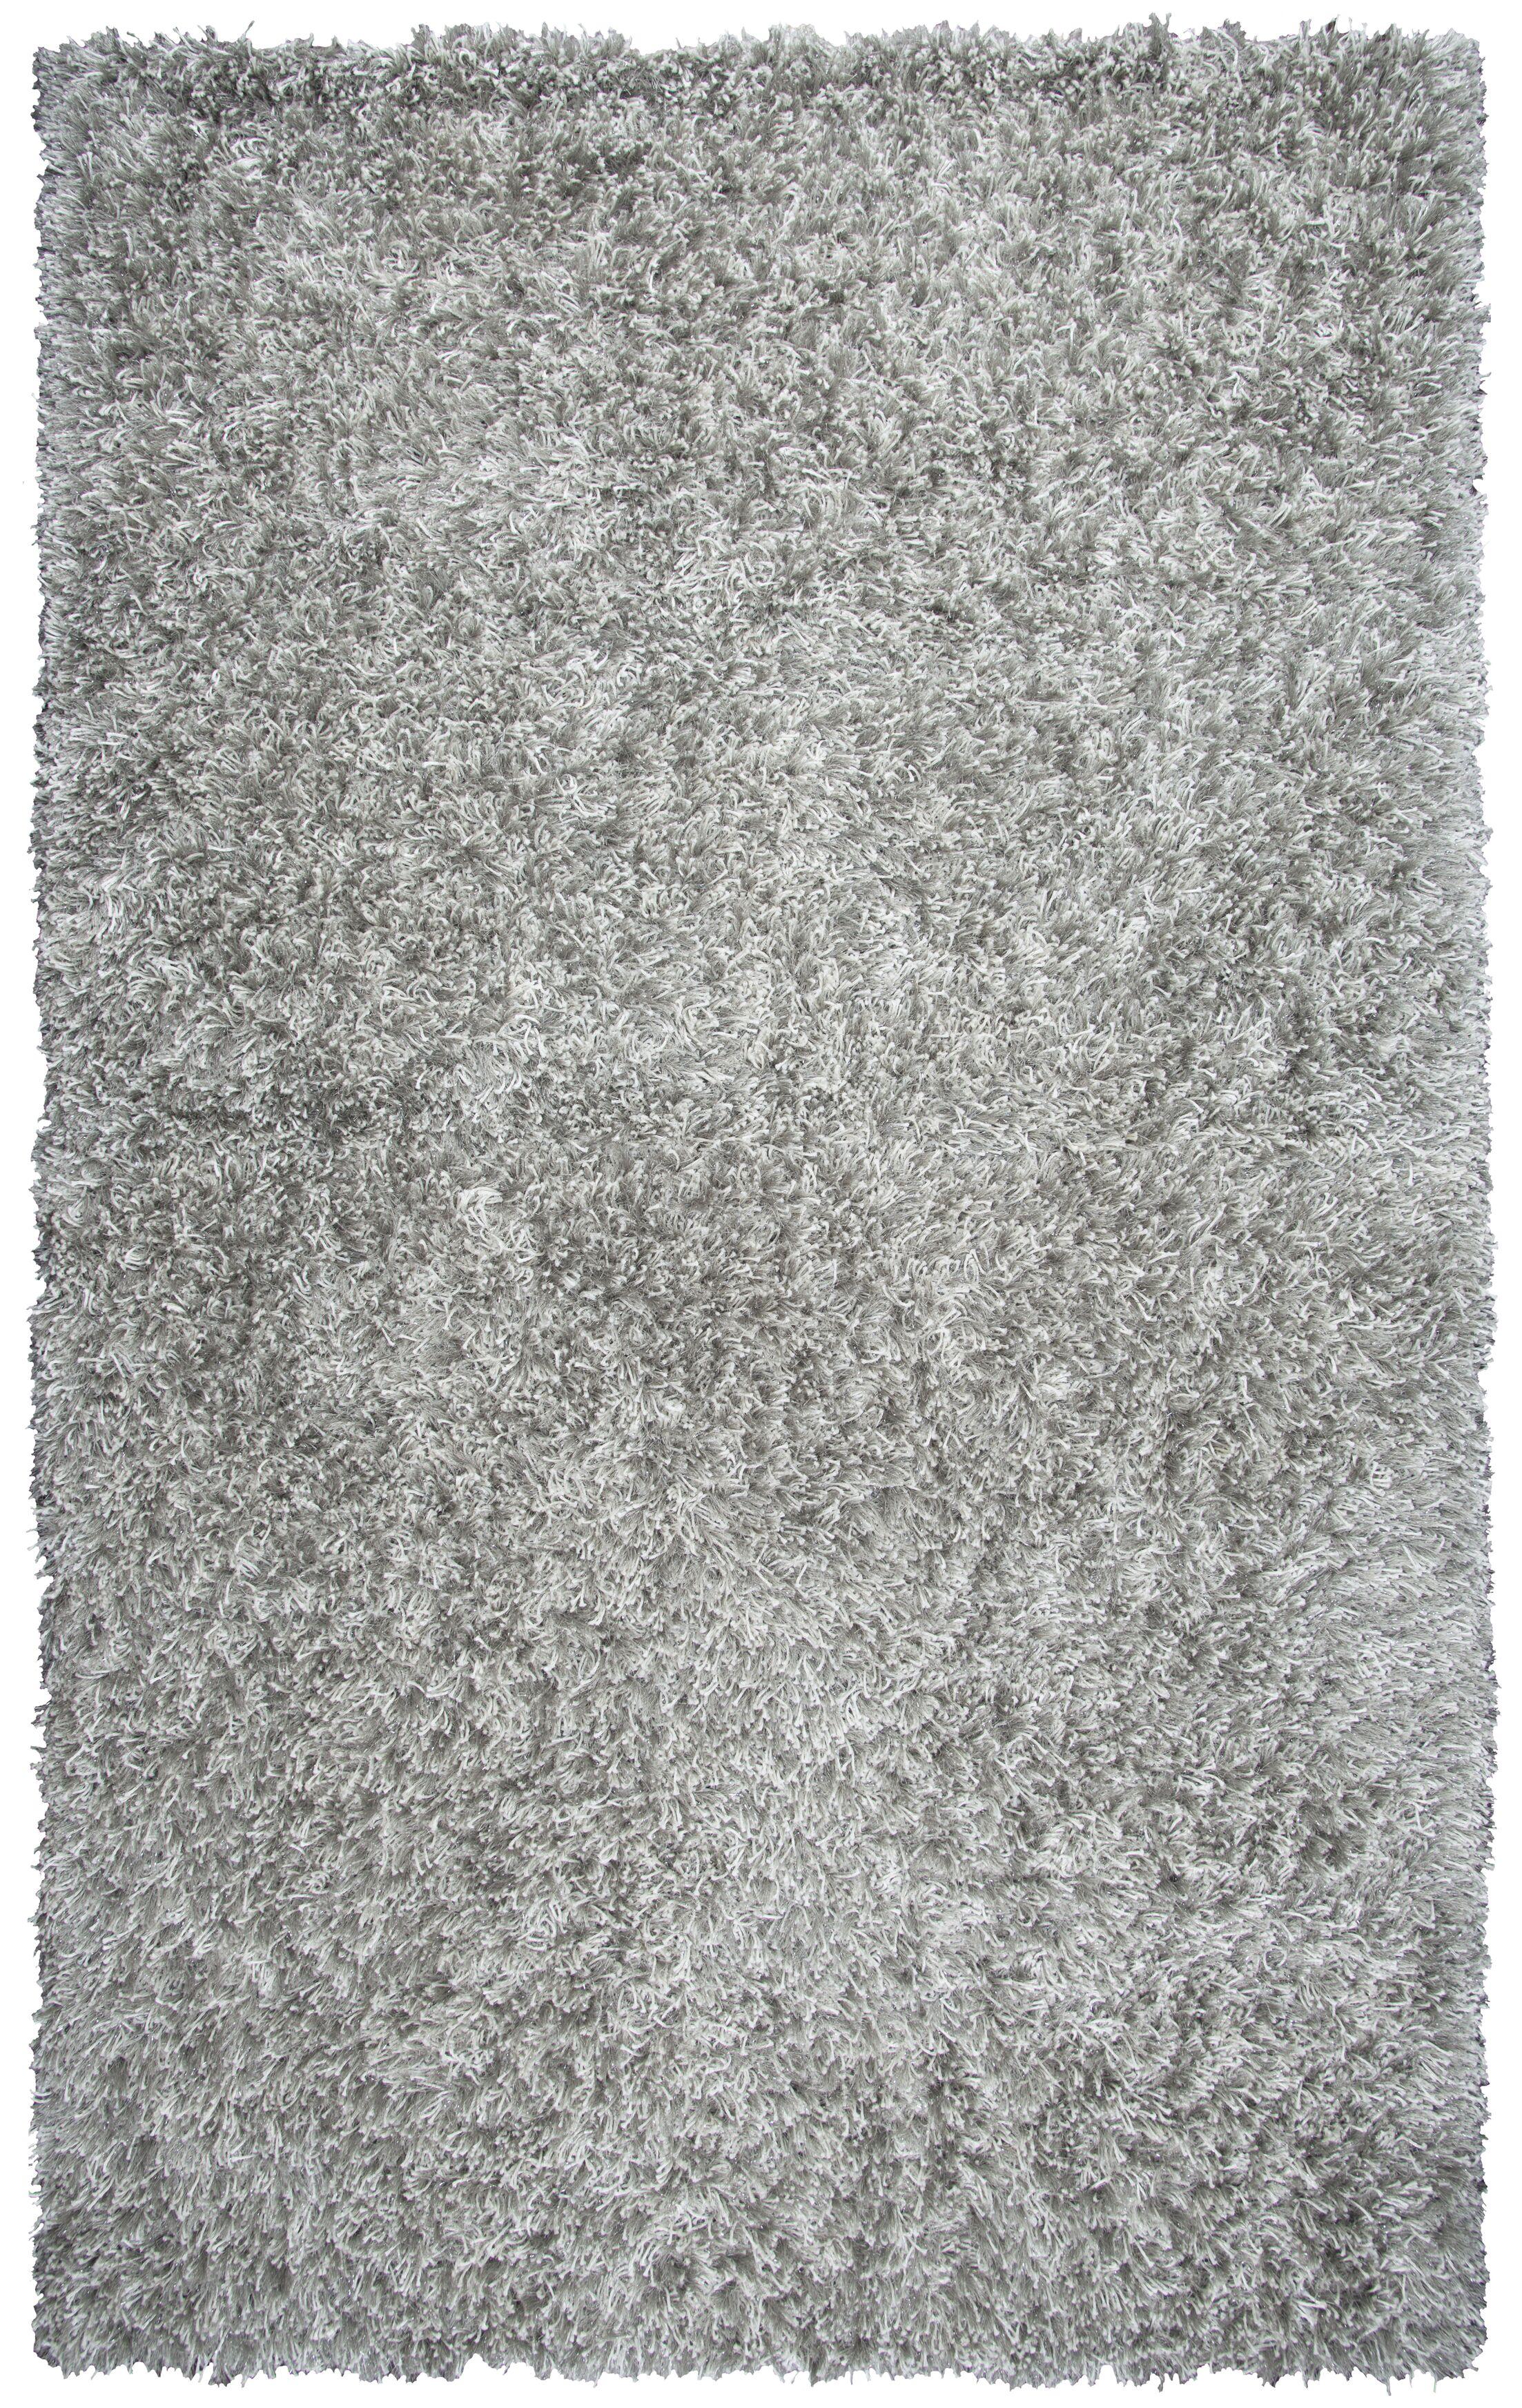 Villegas Hand-Tufted Light Gray Area Rug Rug Size: Rectangle 3'6